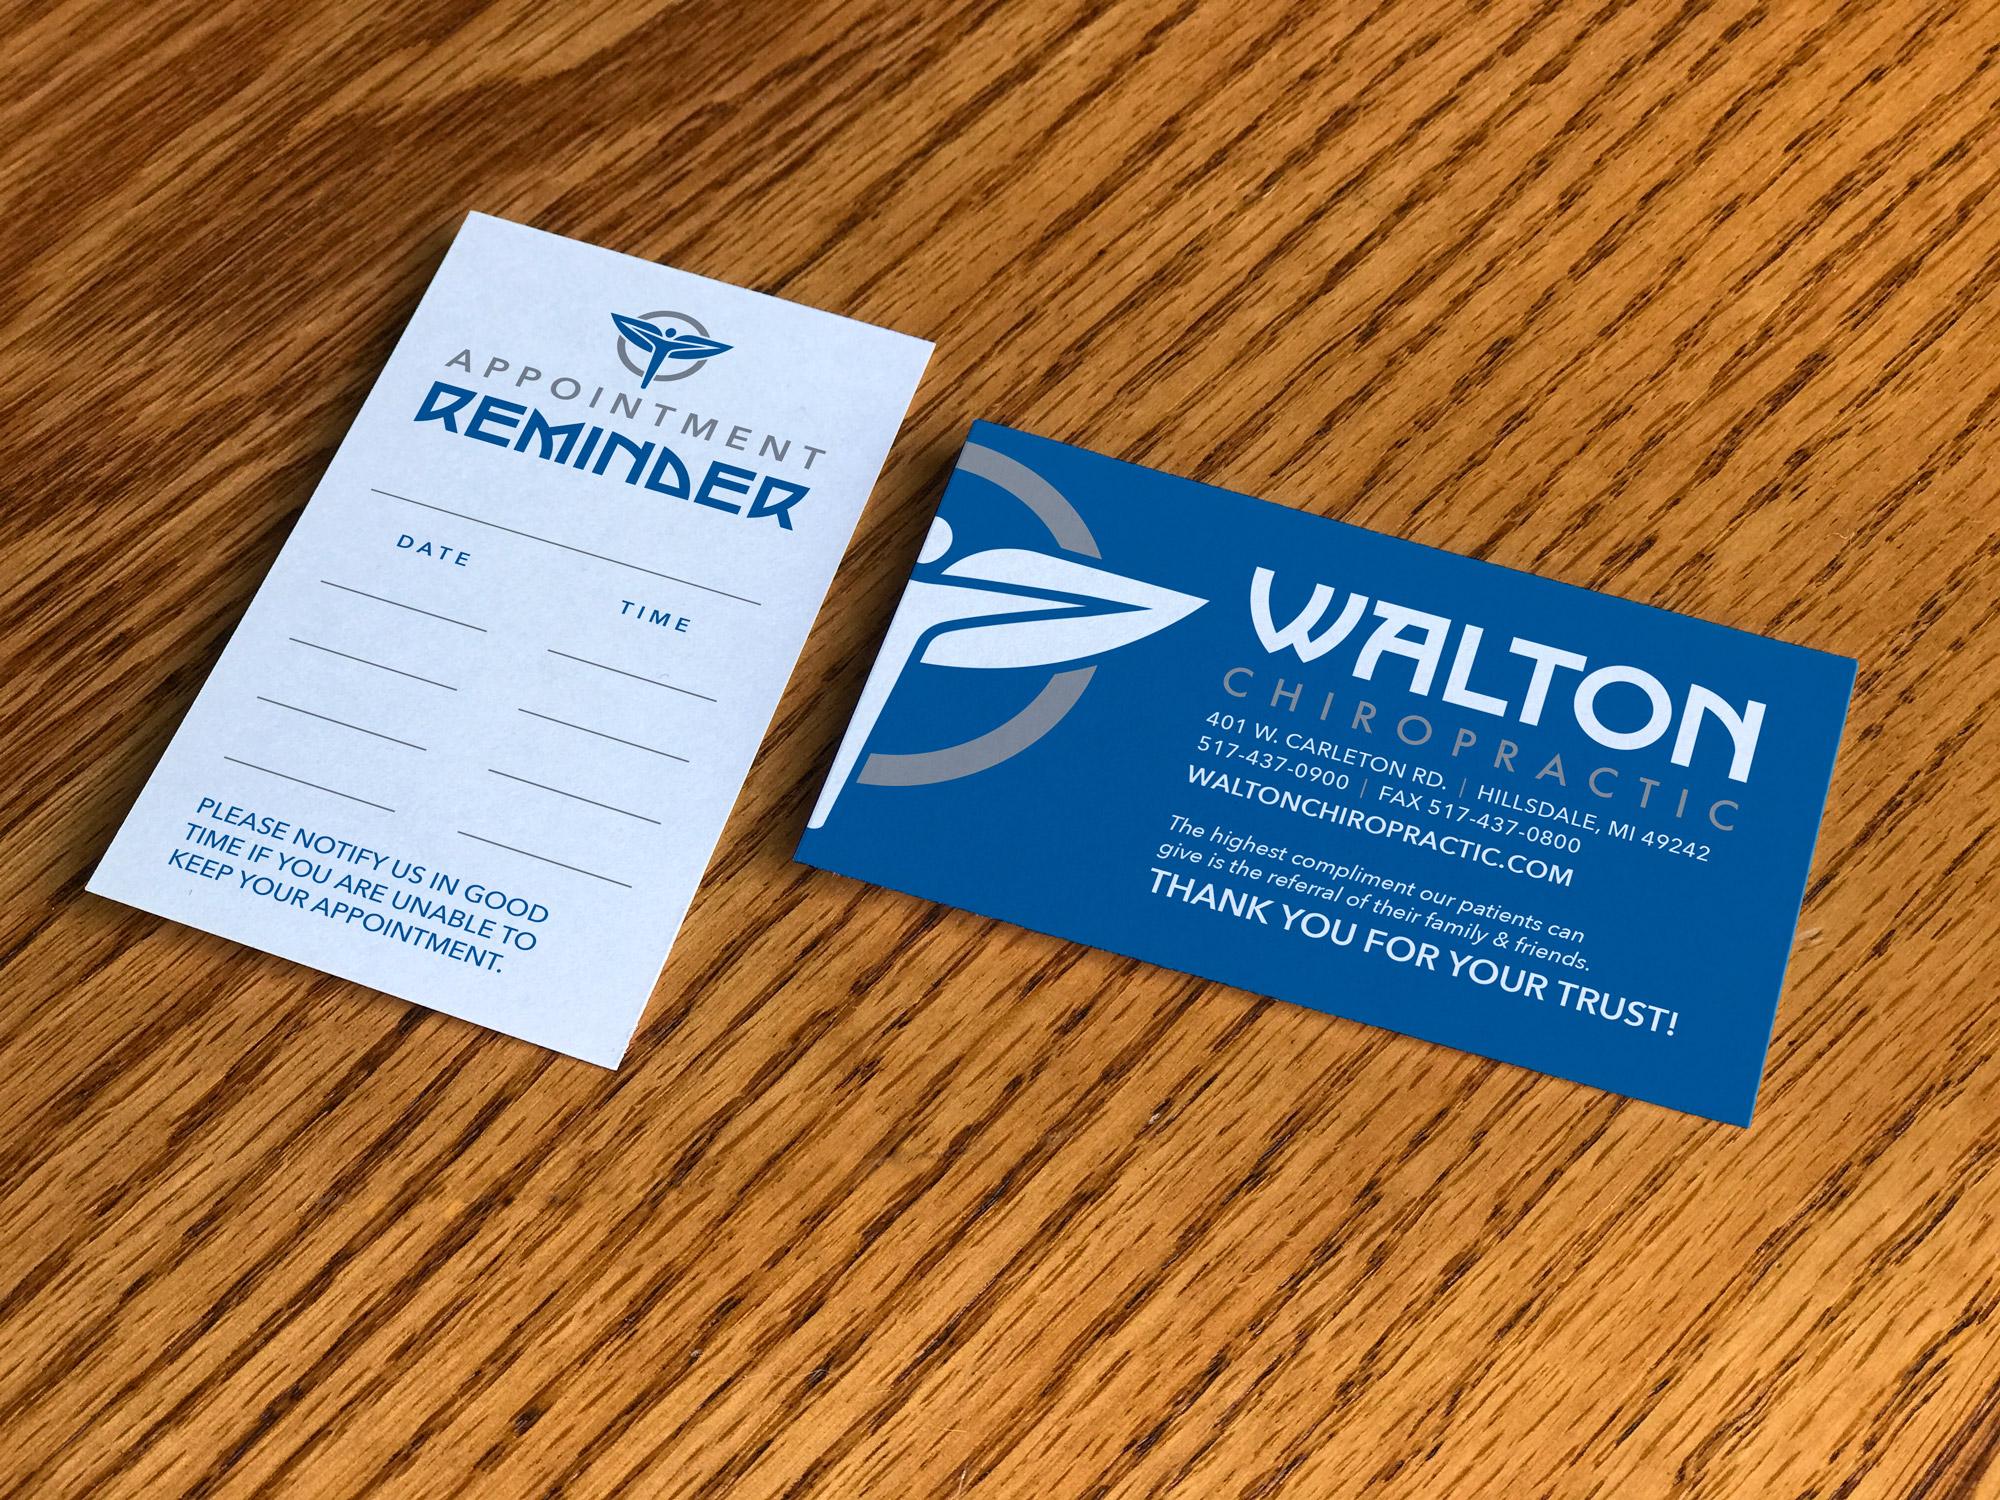 Walton Chiropractic Business Card